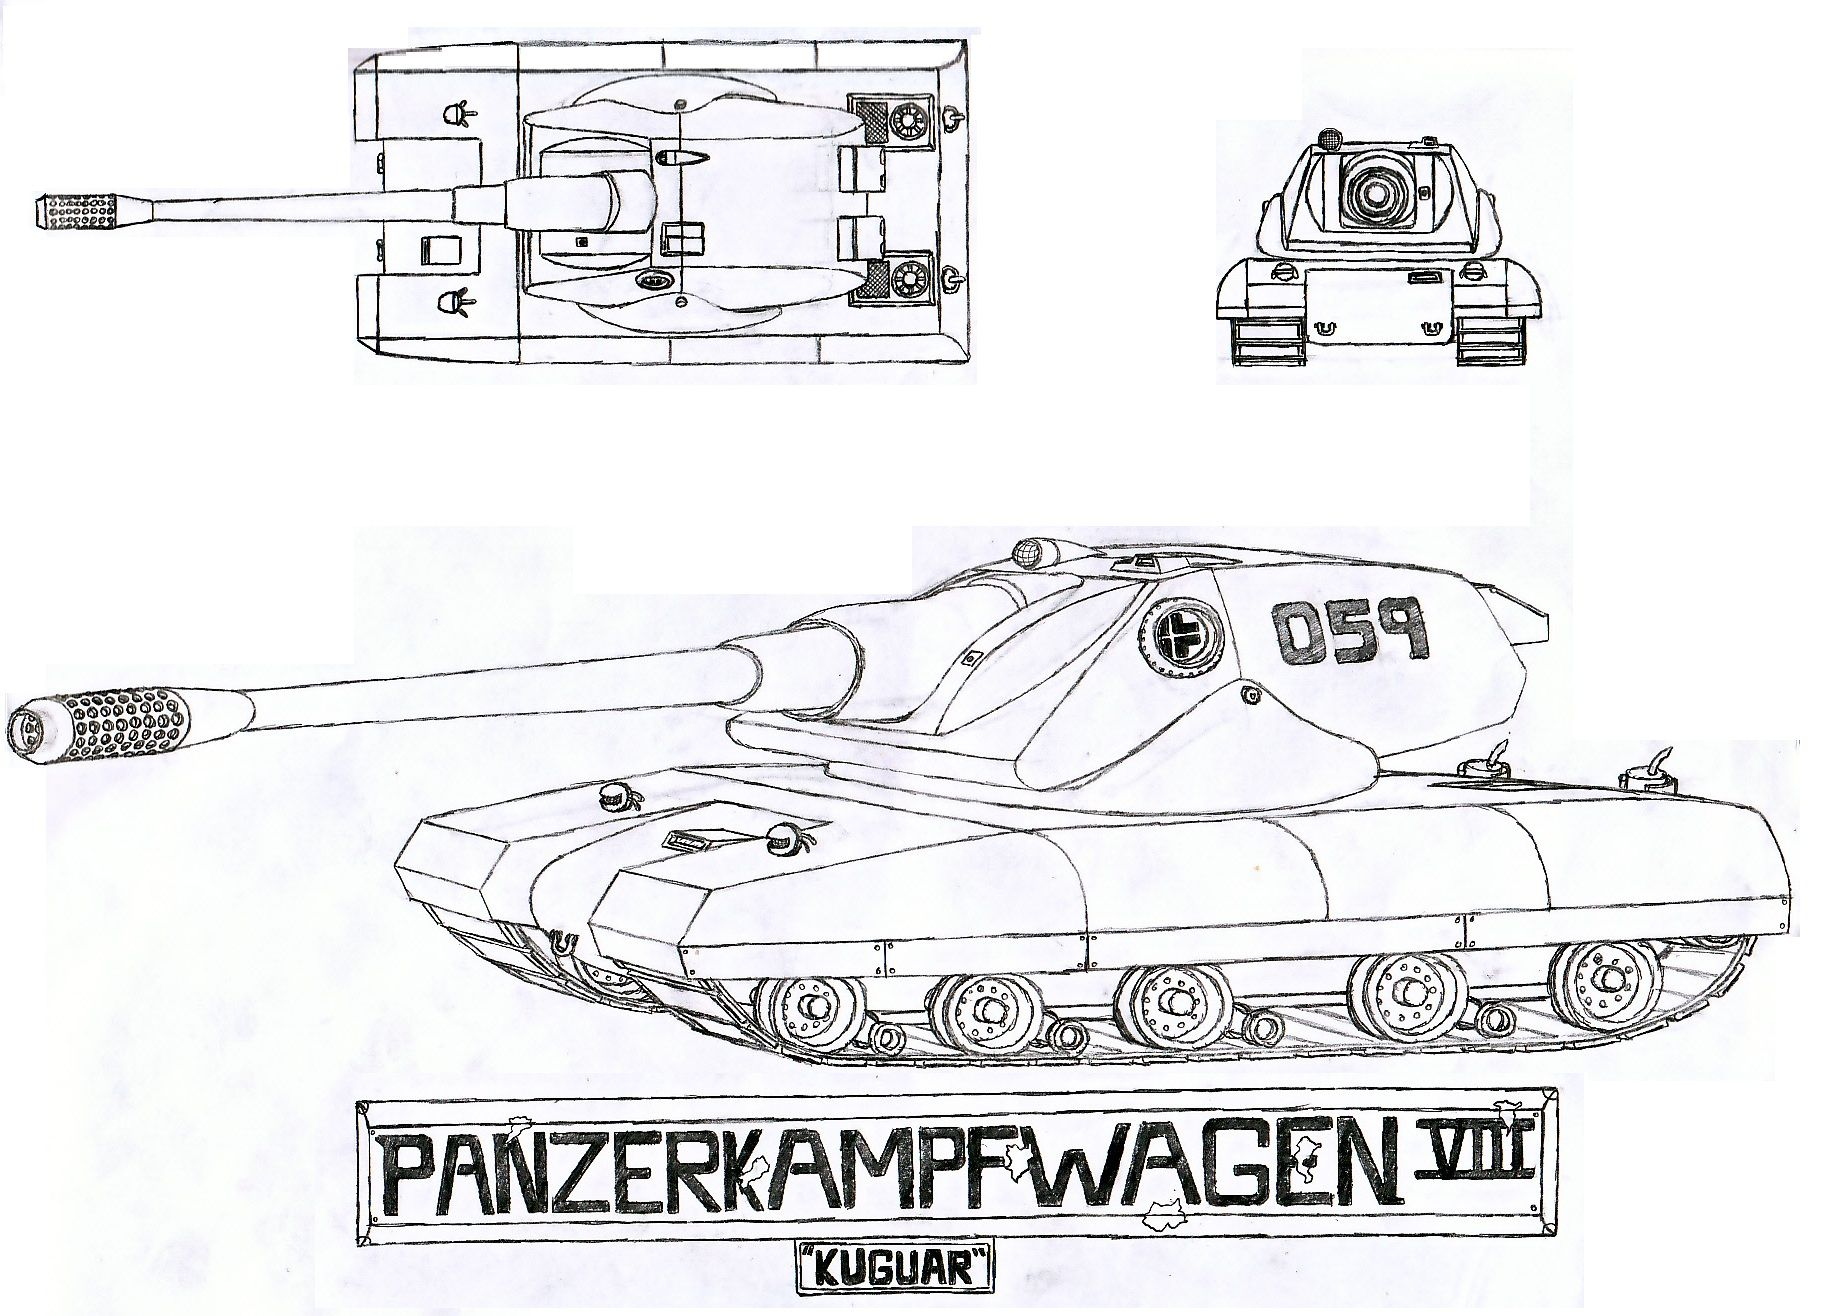 This Here Is The Panzerkampfwagen Viii Kuguar My Newest